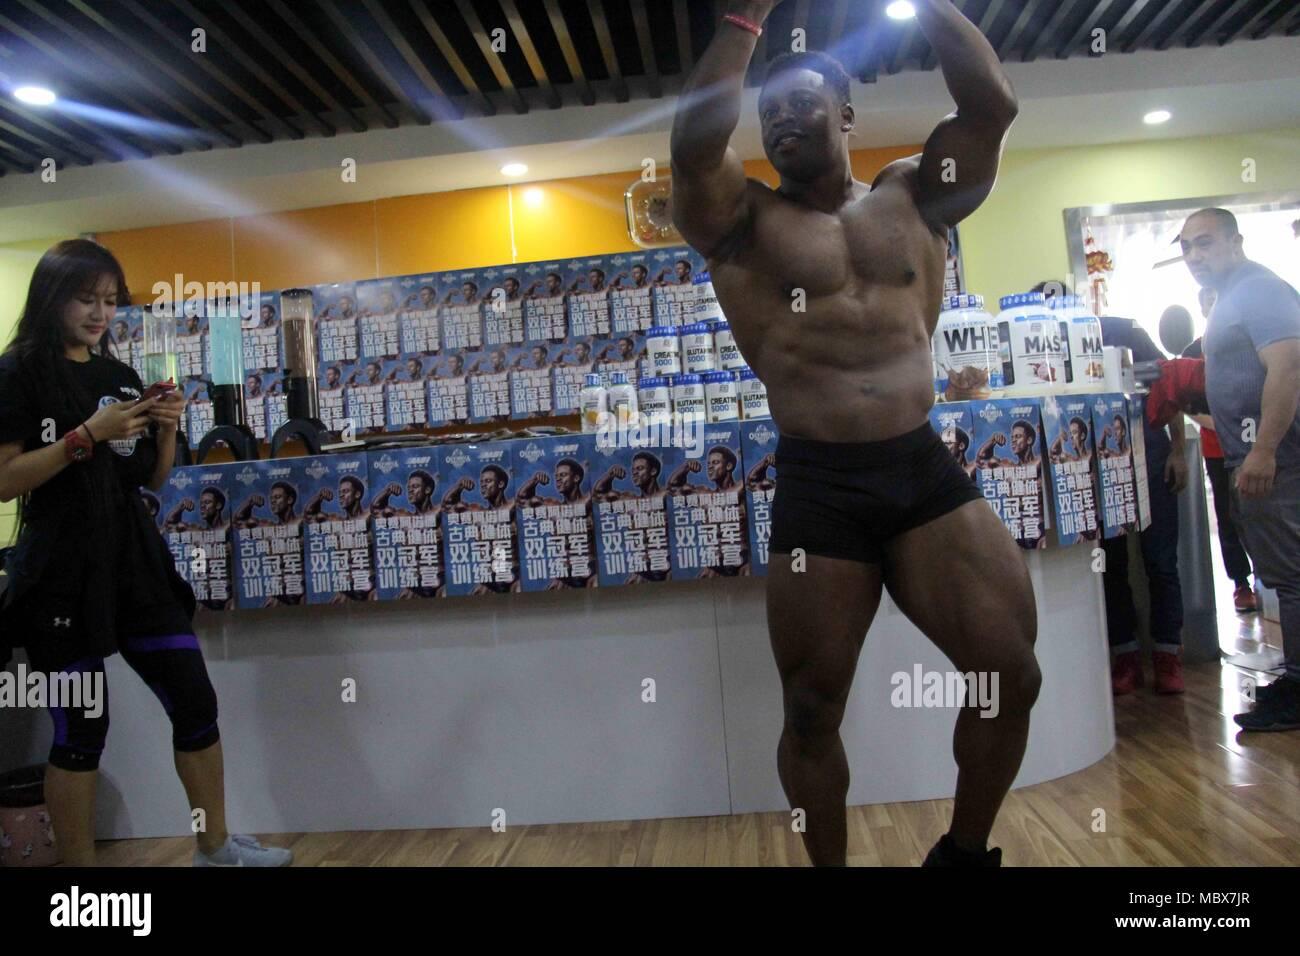 Wuhu Wuhu China 11th Apr 2018 Wuhu China 11th April 2018 Physique Champion Breon Ansley Shares